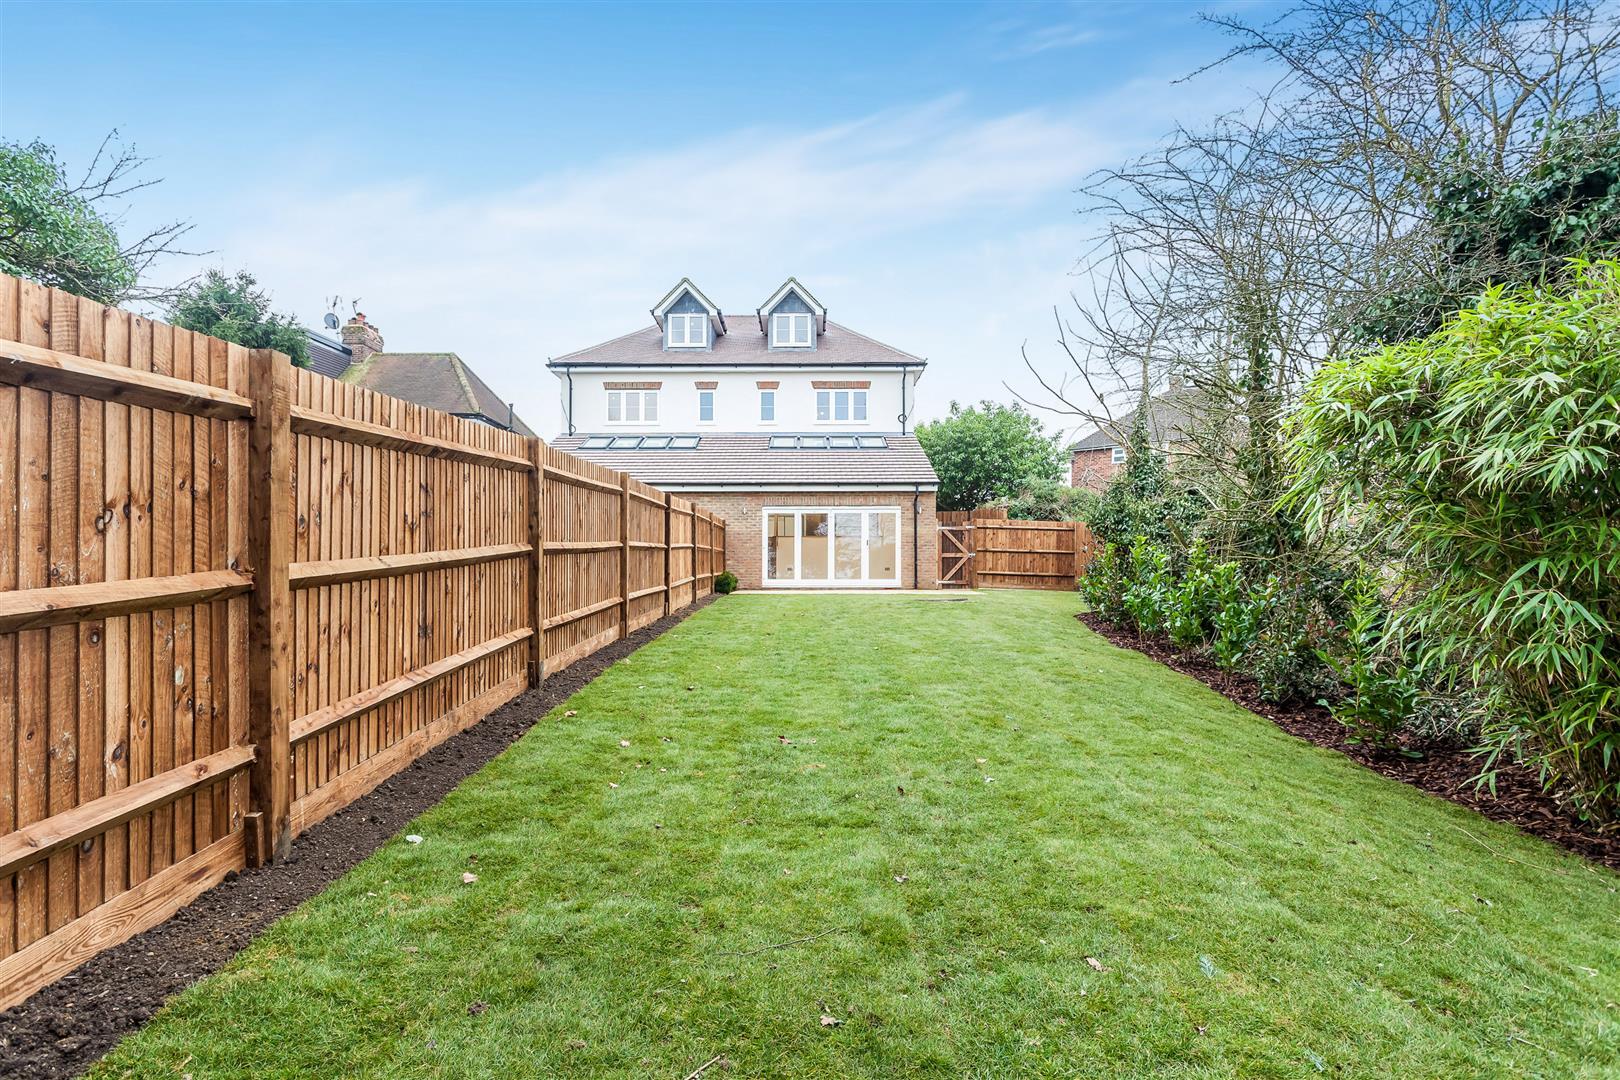 4 Bedroom Semi Detached House For Sale In Bushey